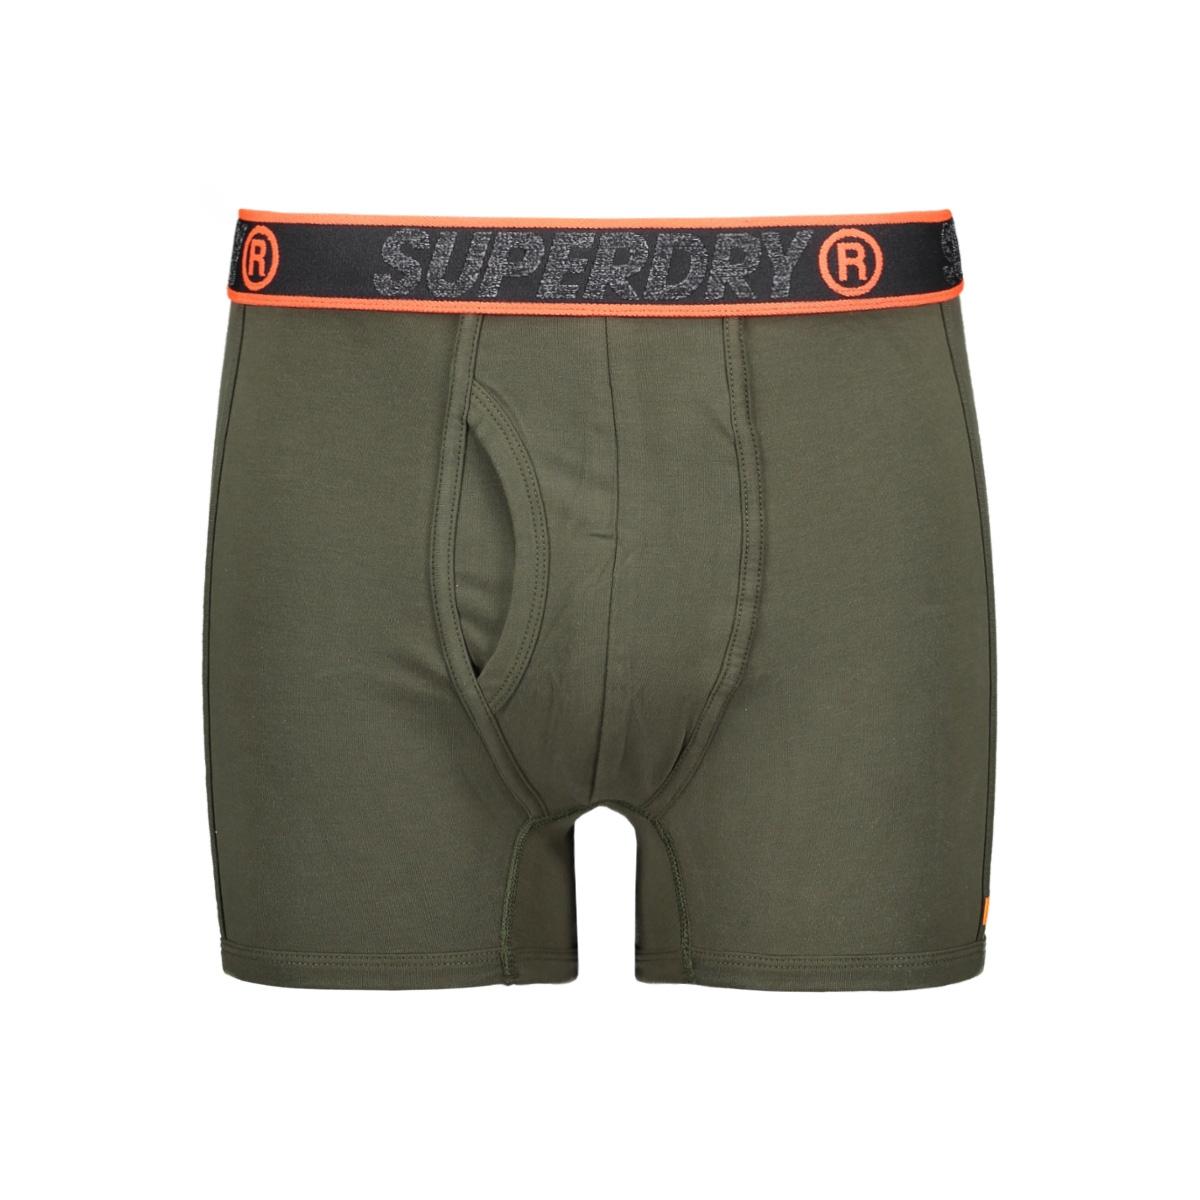 sport boxer dbl pack m3100019a superdry ondergoed nordic khaki